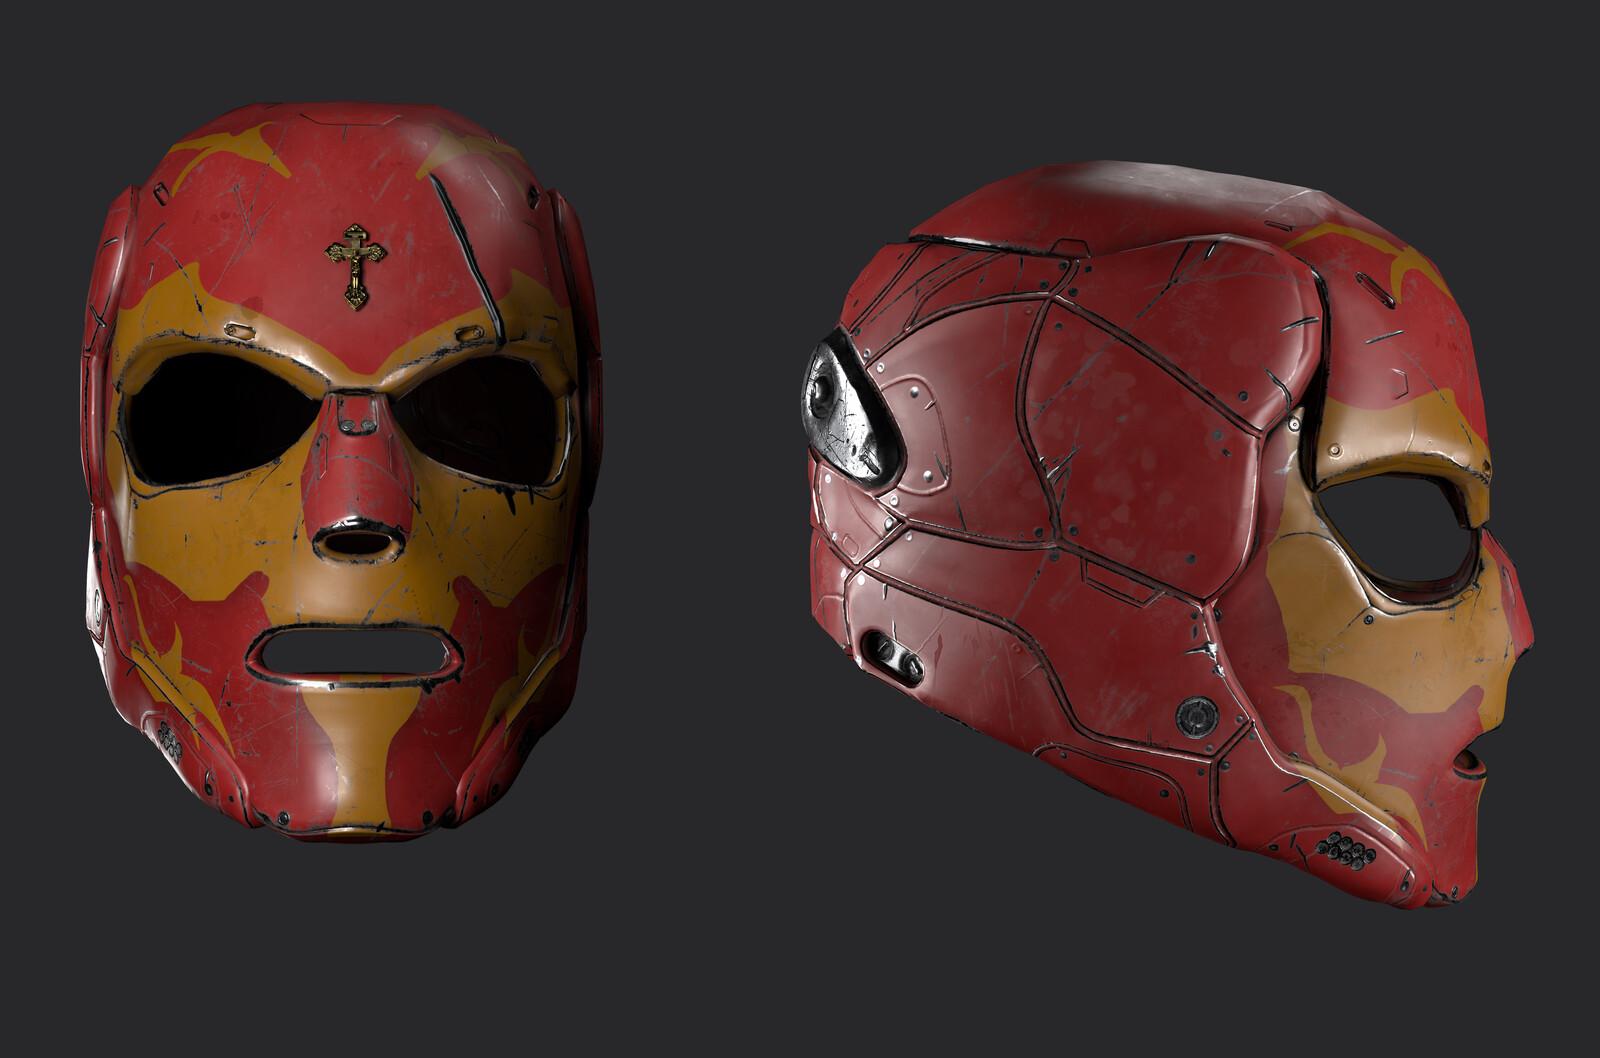 Sci Fi Luchodore helmet